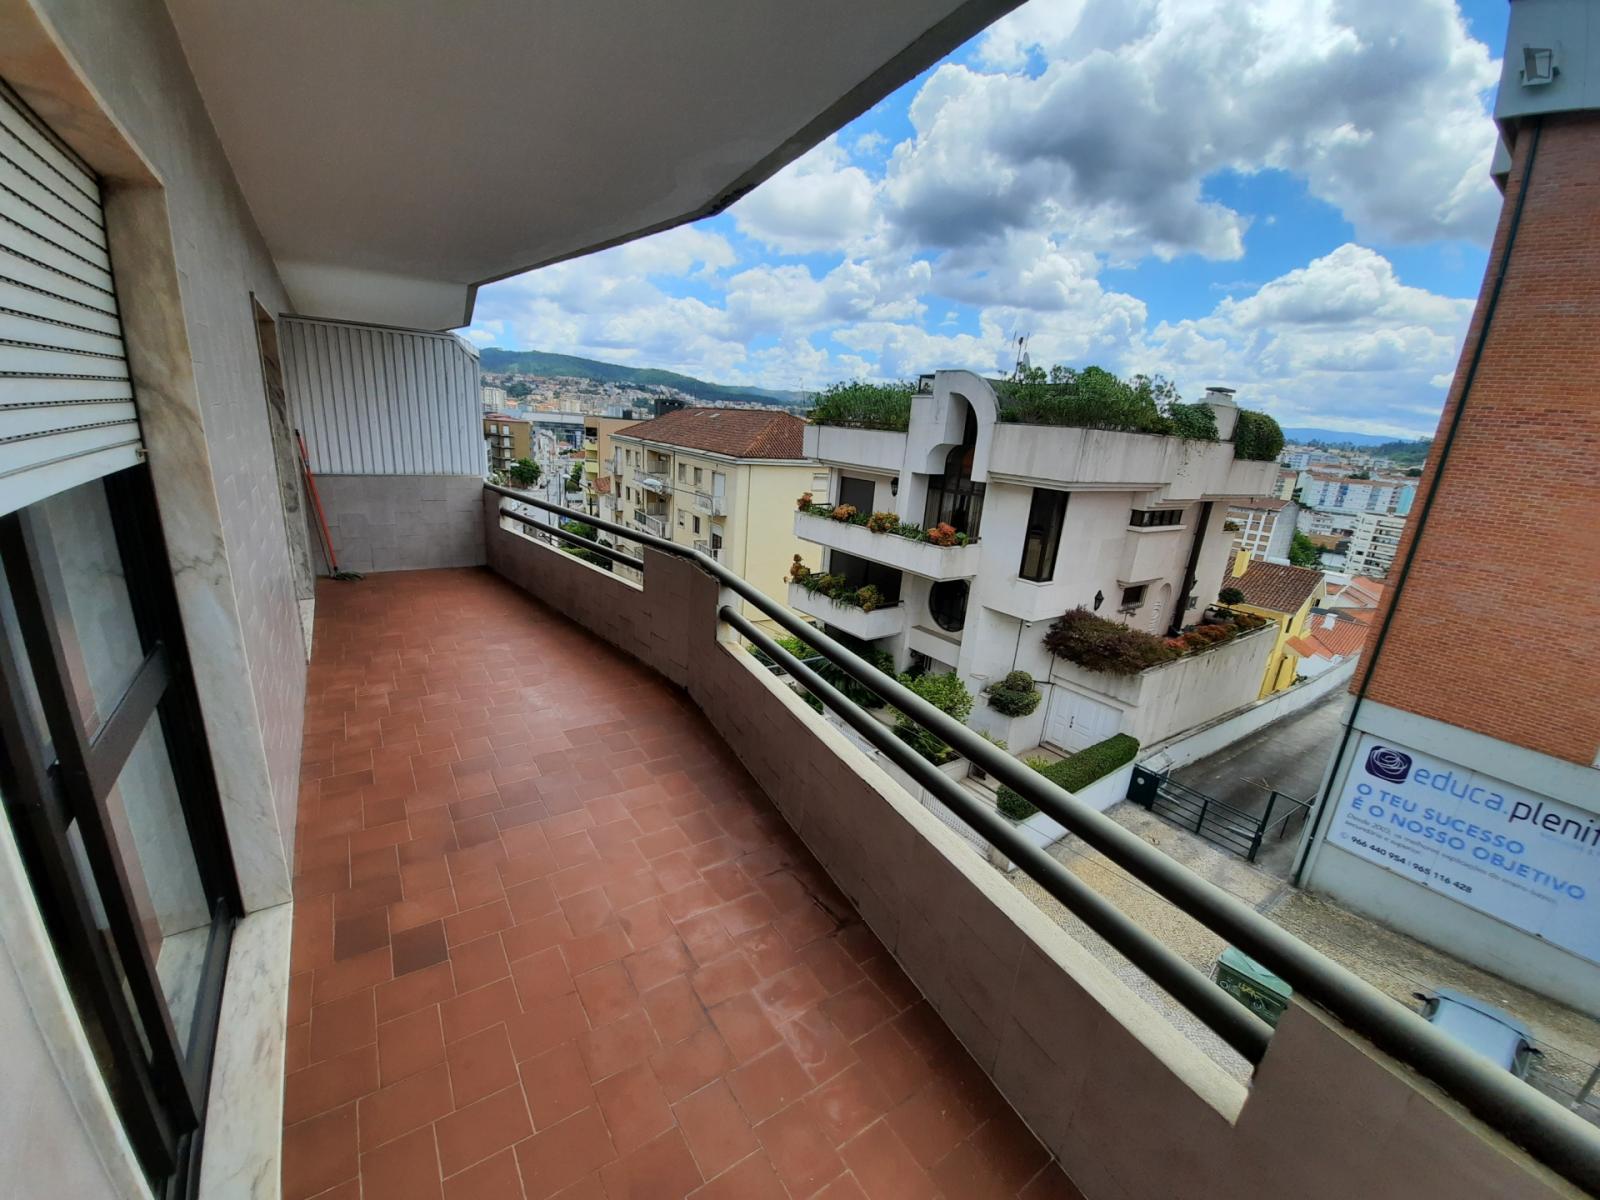 Rua Combatentes da Grande Guerra, Coimbra, PT-06 - 630 EUR/ month